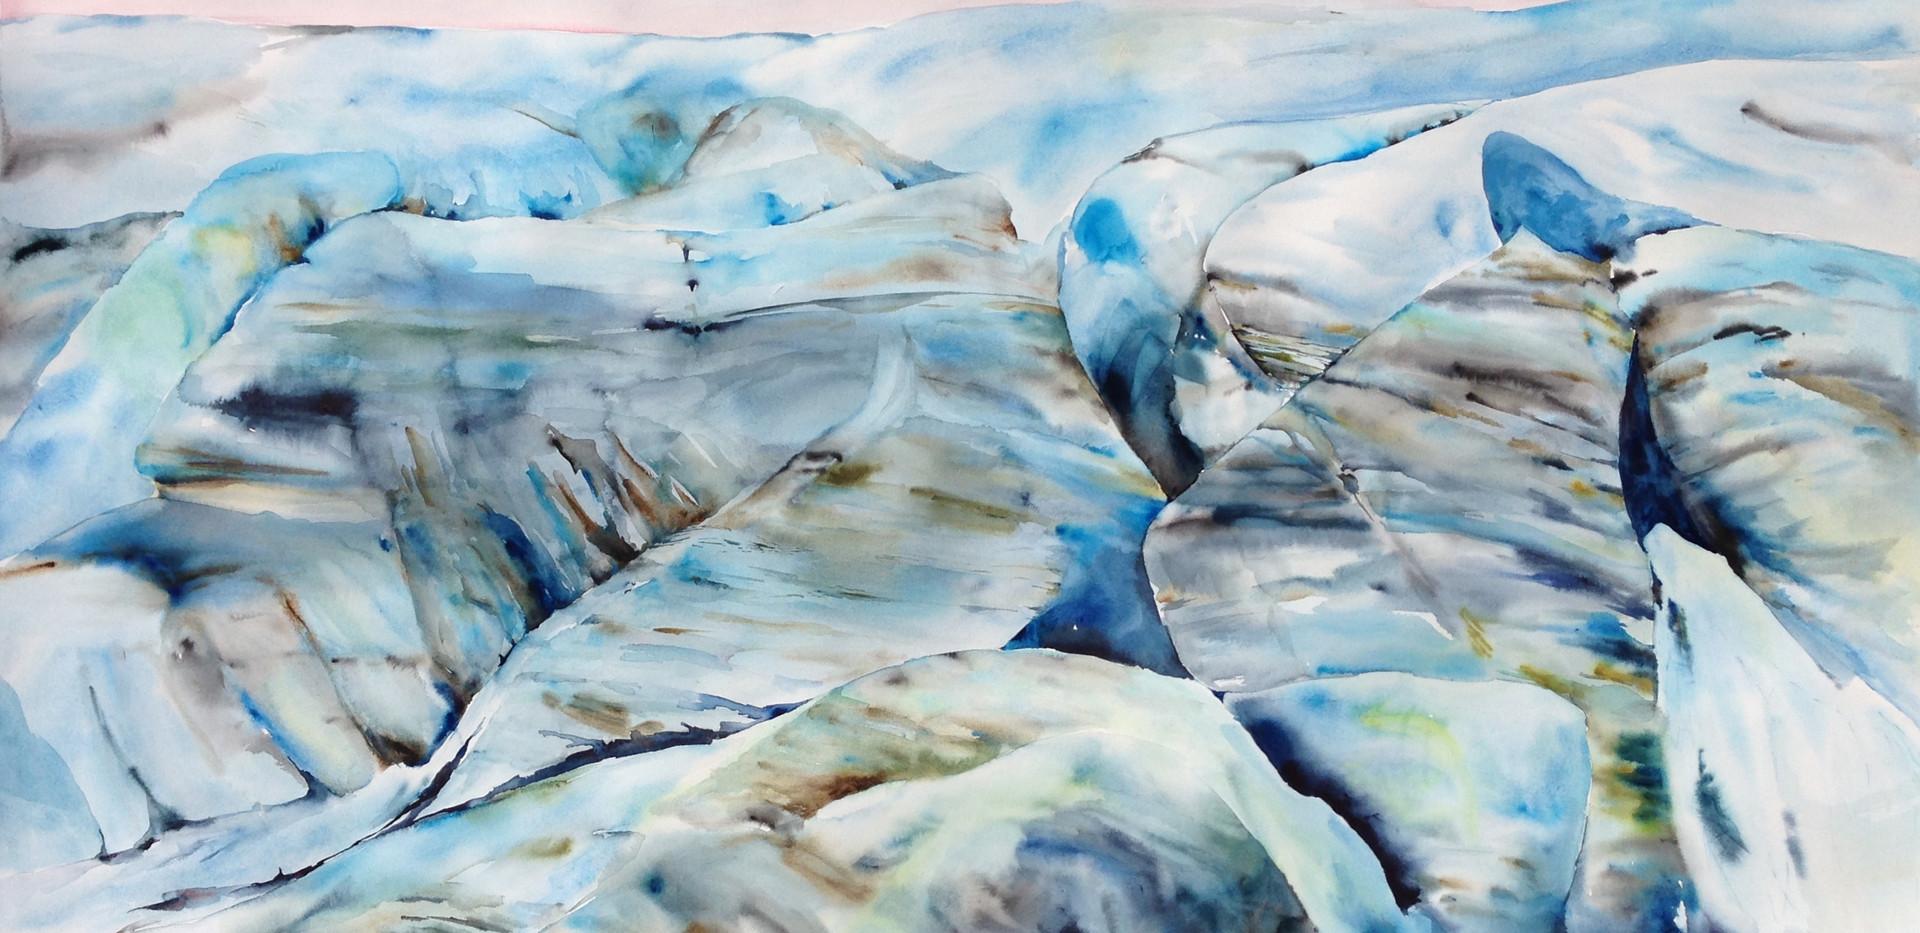 Iceland Glacier with Stripes